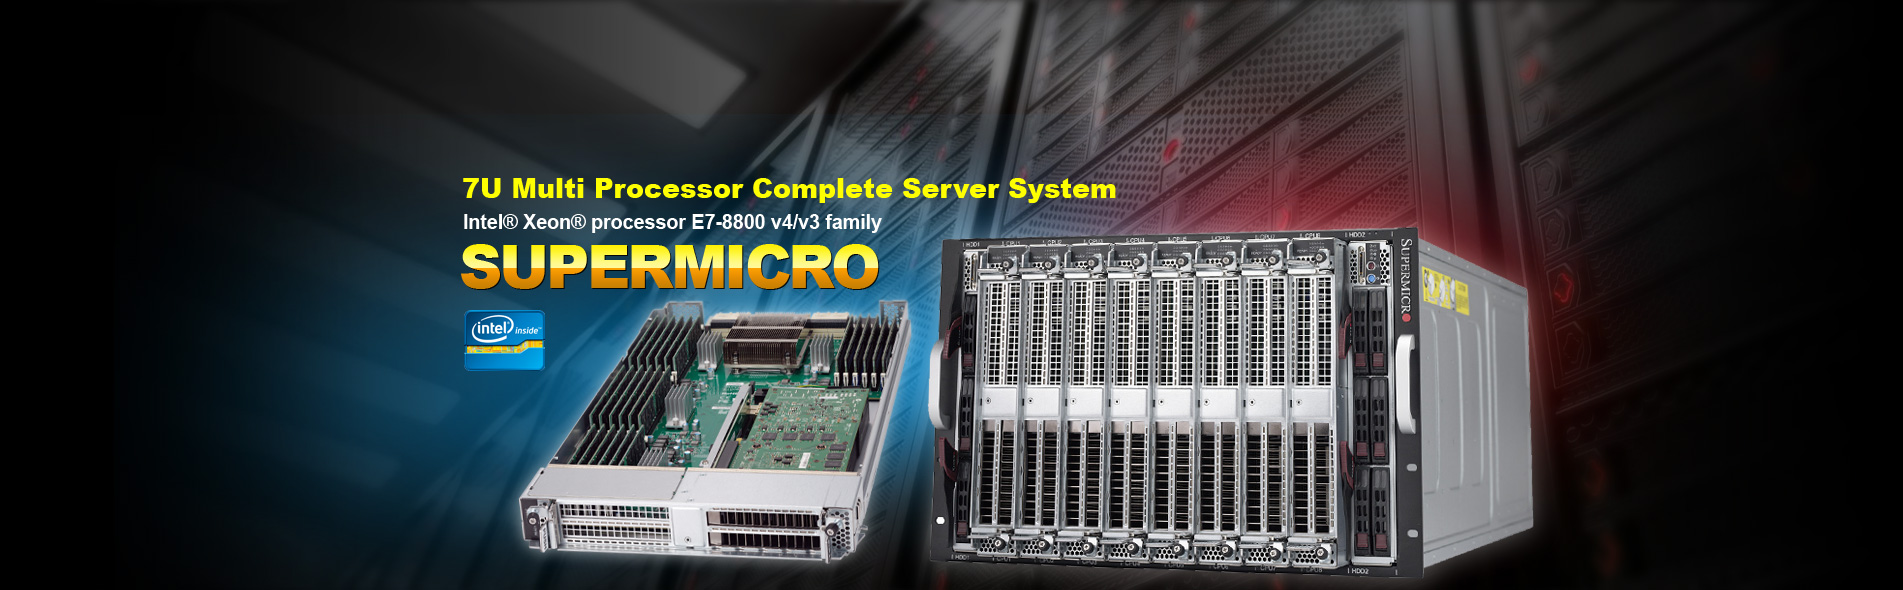 Supermicro Servers, Data Storage & Solutions - Superxpert